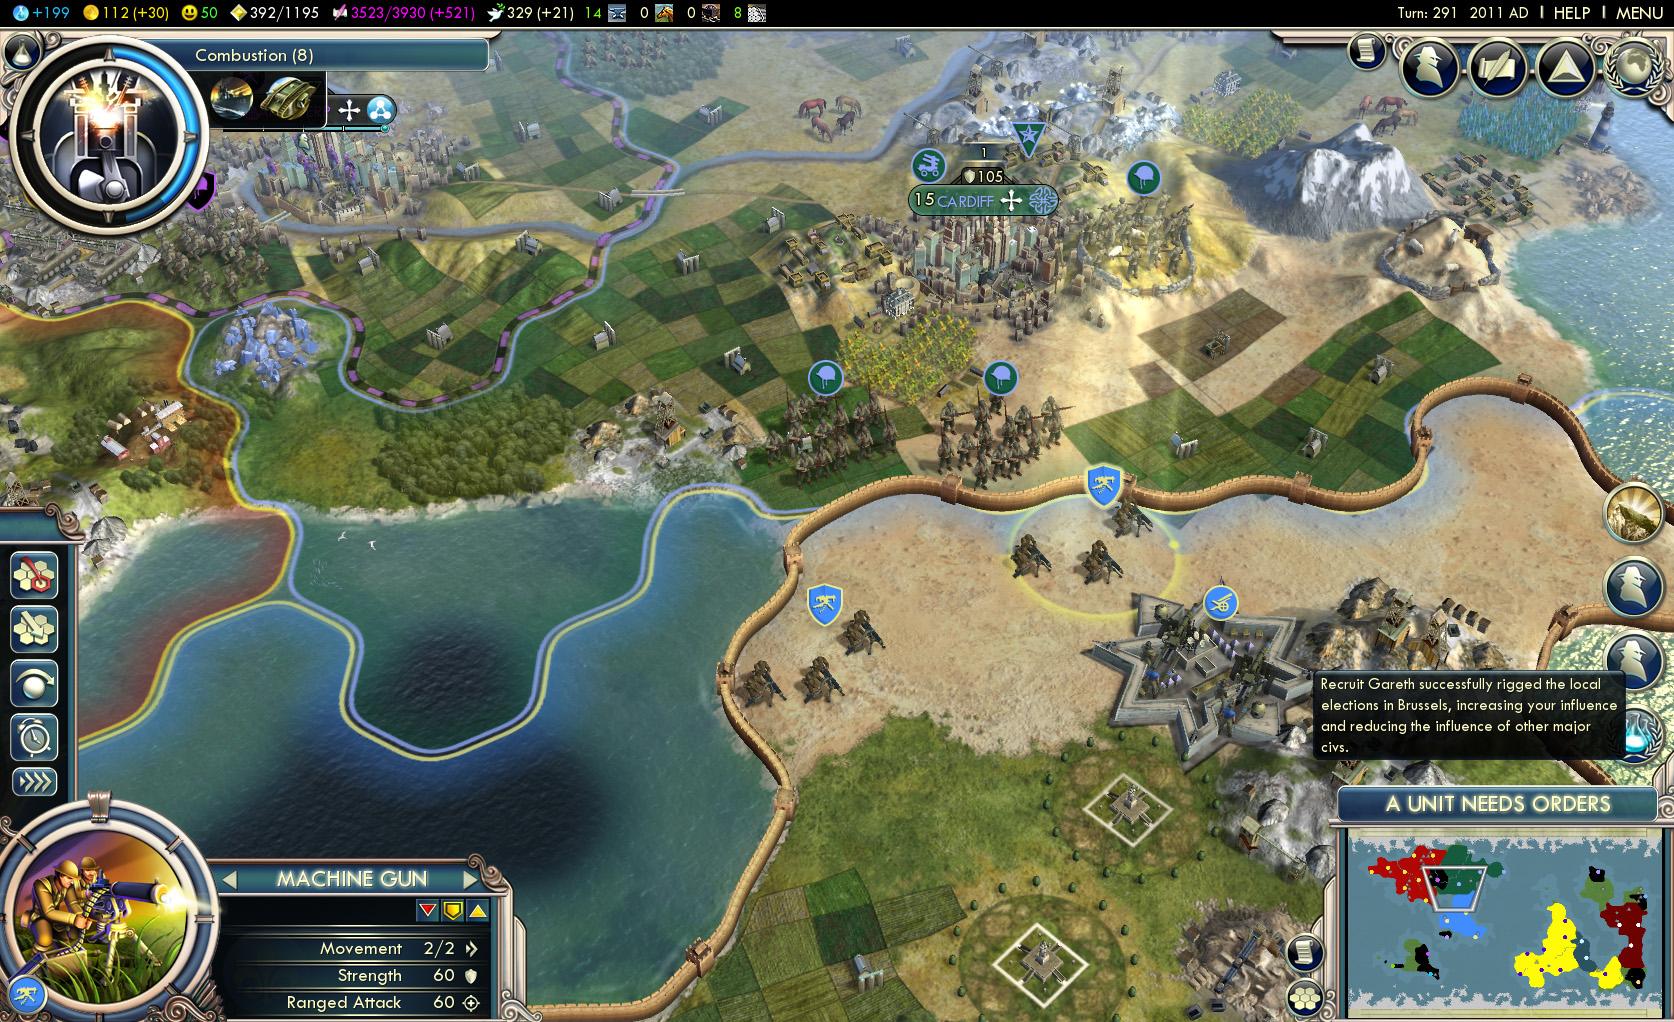 Celtic (Civ5) | Civilization Wiki | FANDOM powered by Wikia